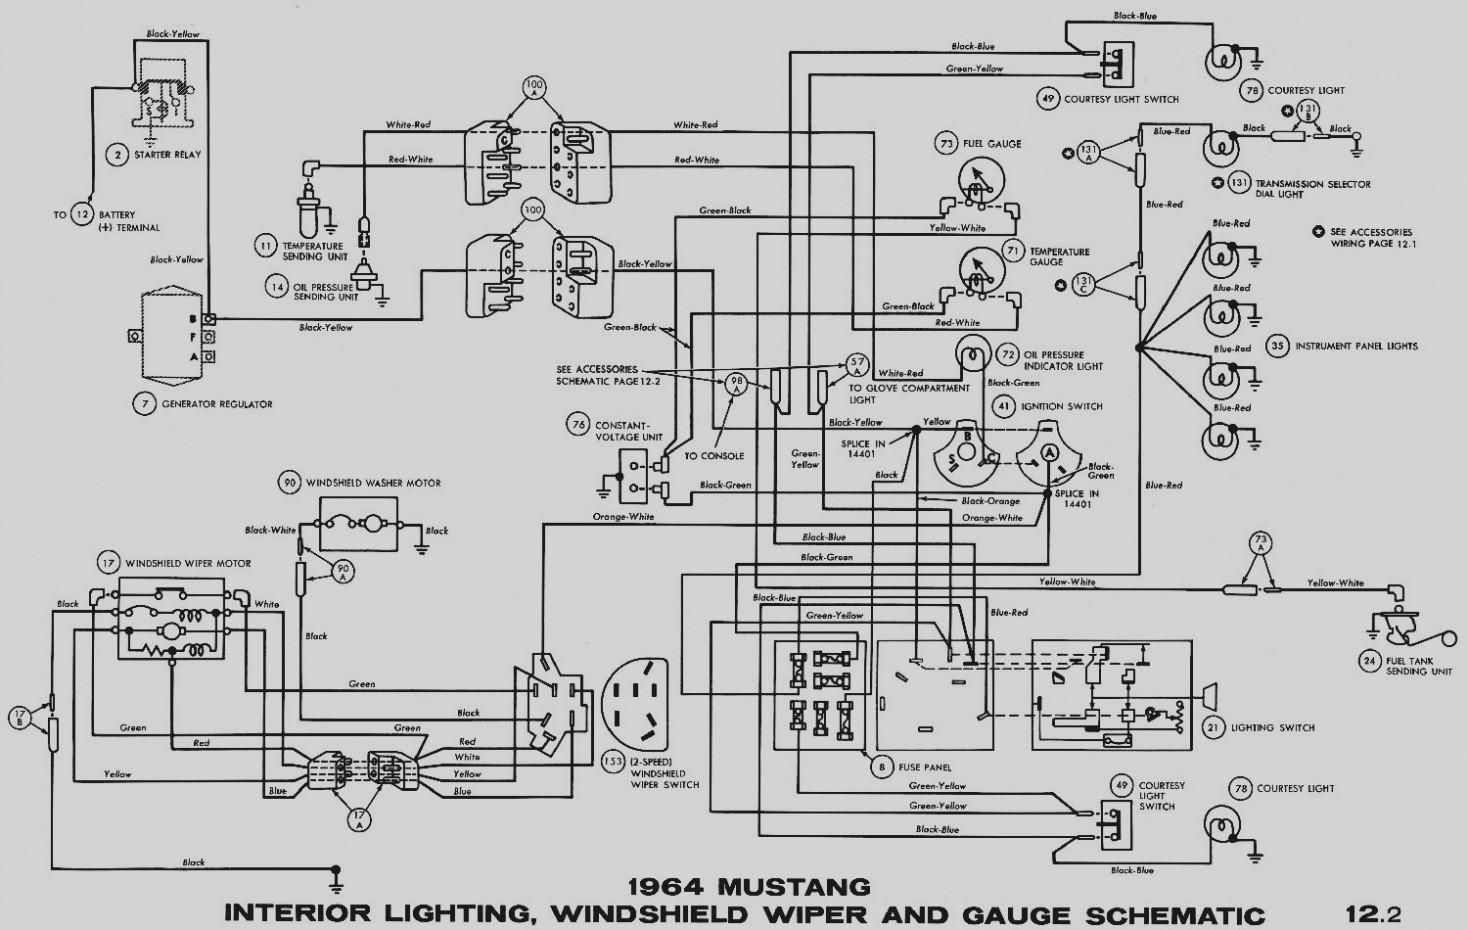 66 Mustang Wiper Switch Wiring Diagram